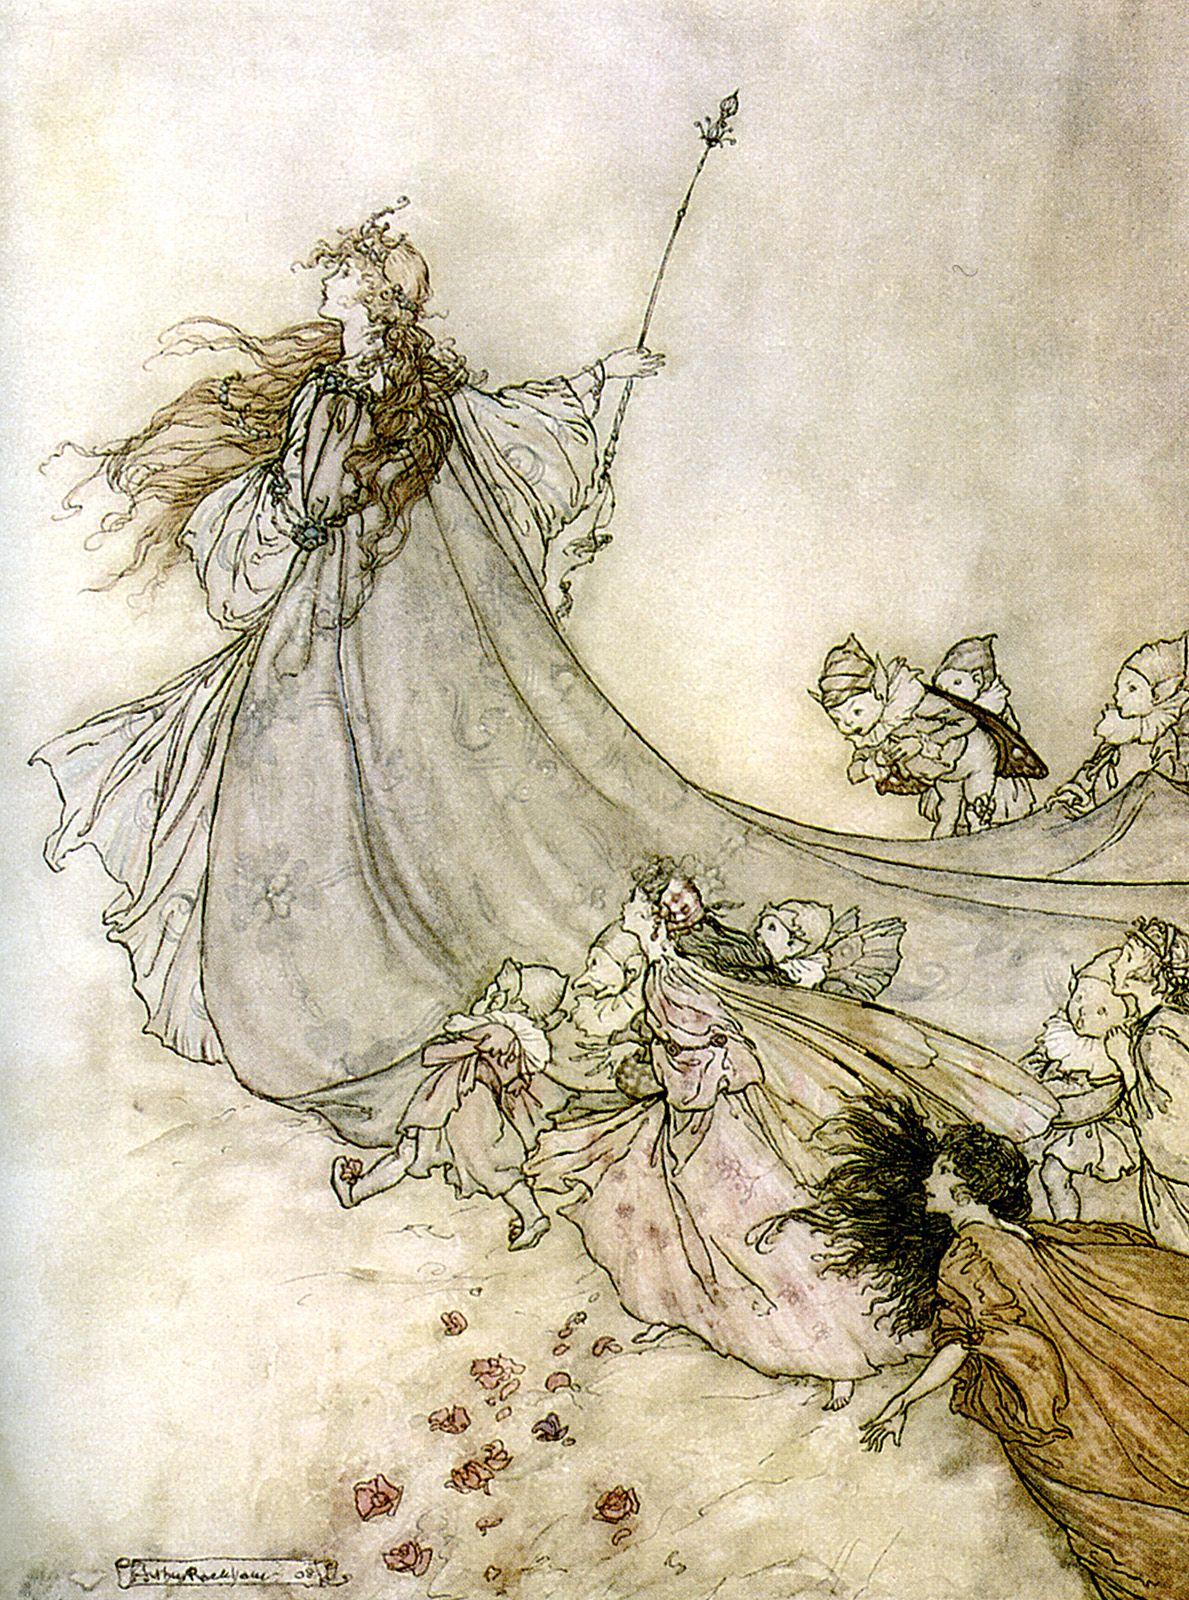 Fairies away! We shall chide downright, if I longer stay  A Midsummer-Night's Dream  illus.  Arthur Rackham